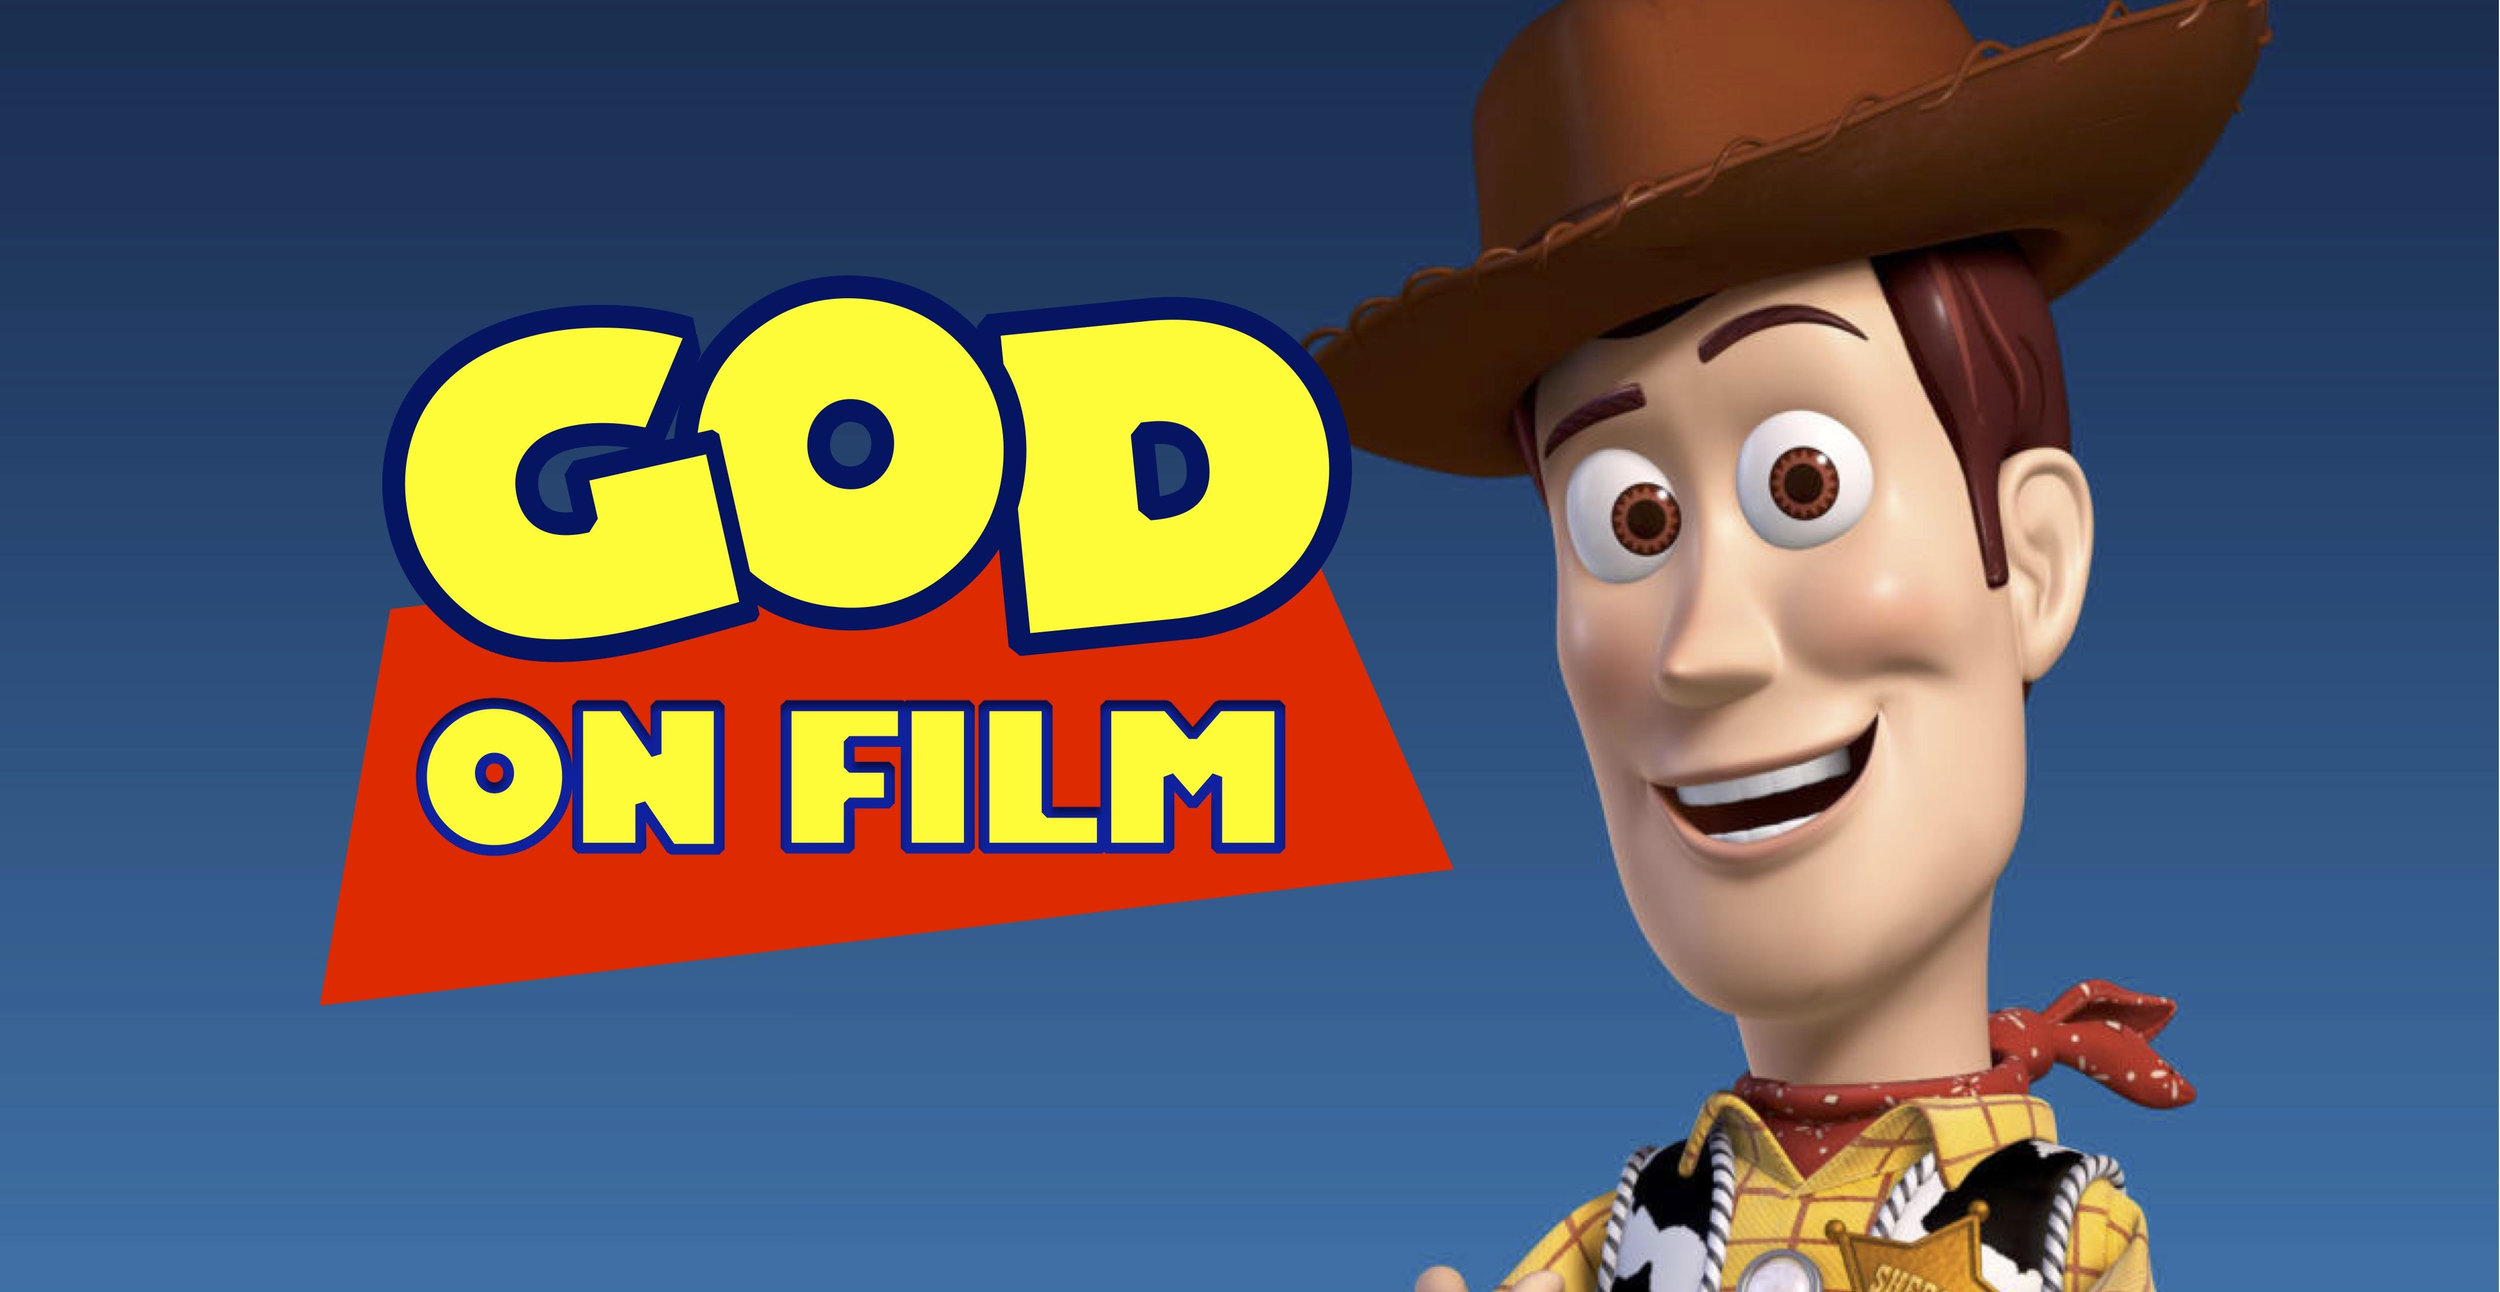 God On Film